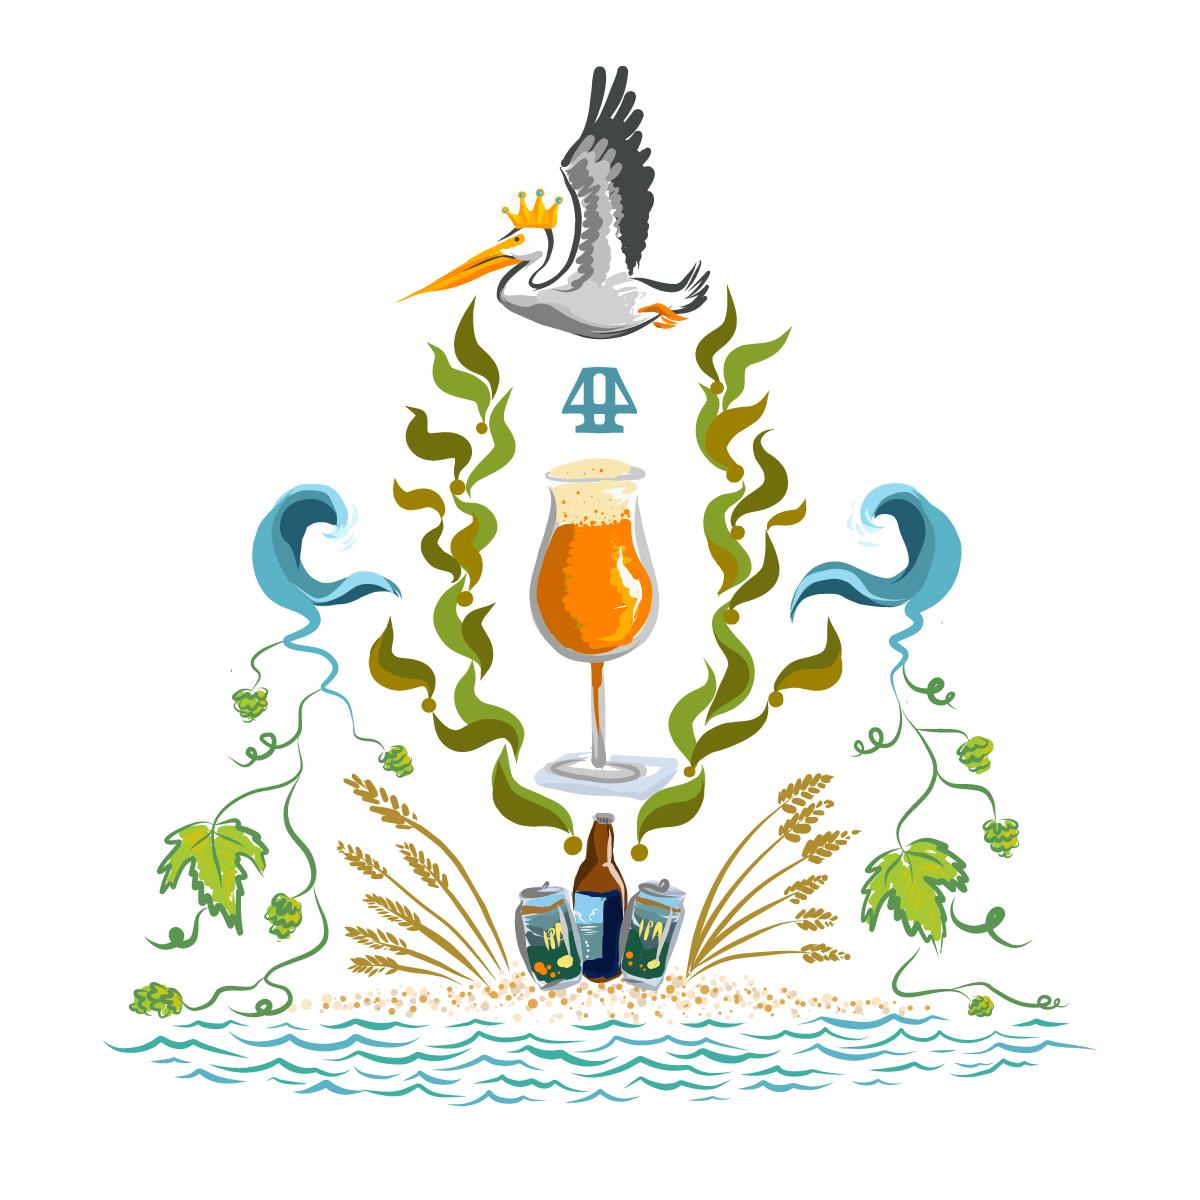 4th Anniversary Emblem